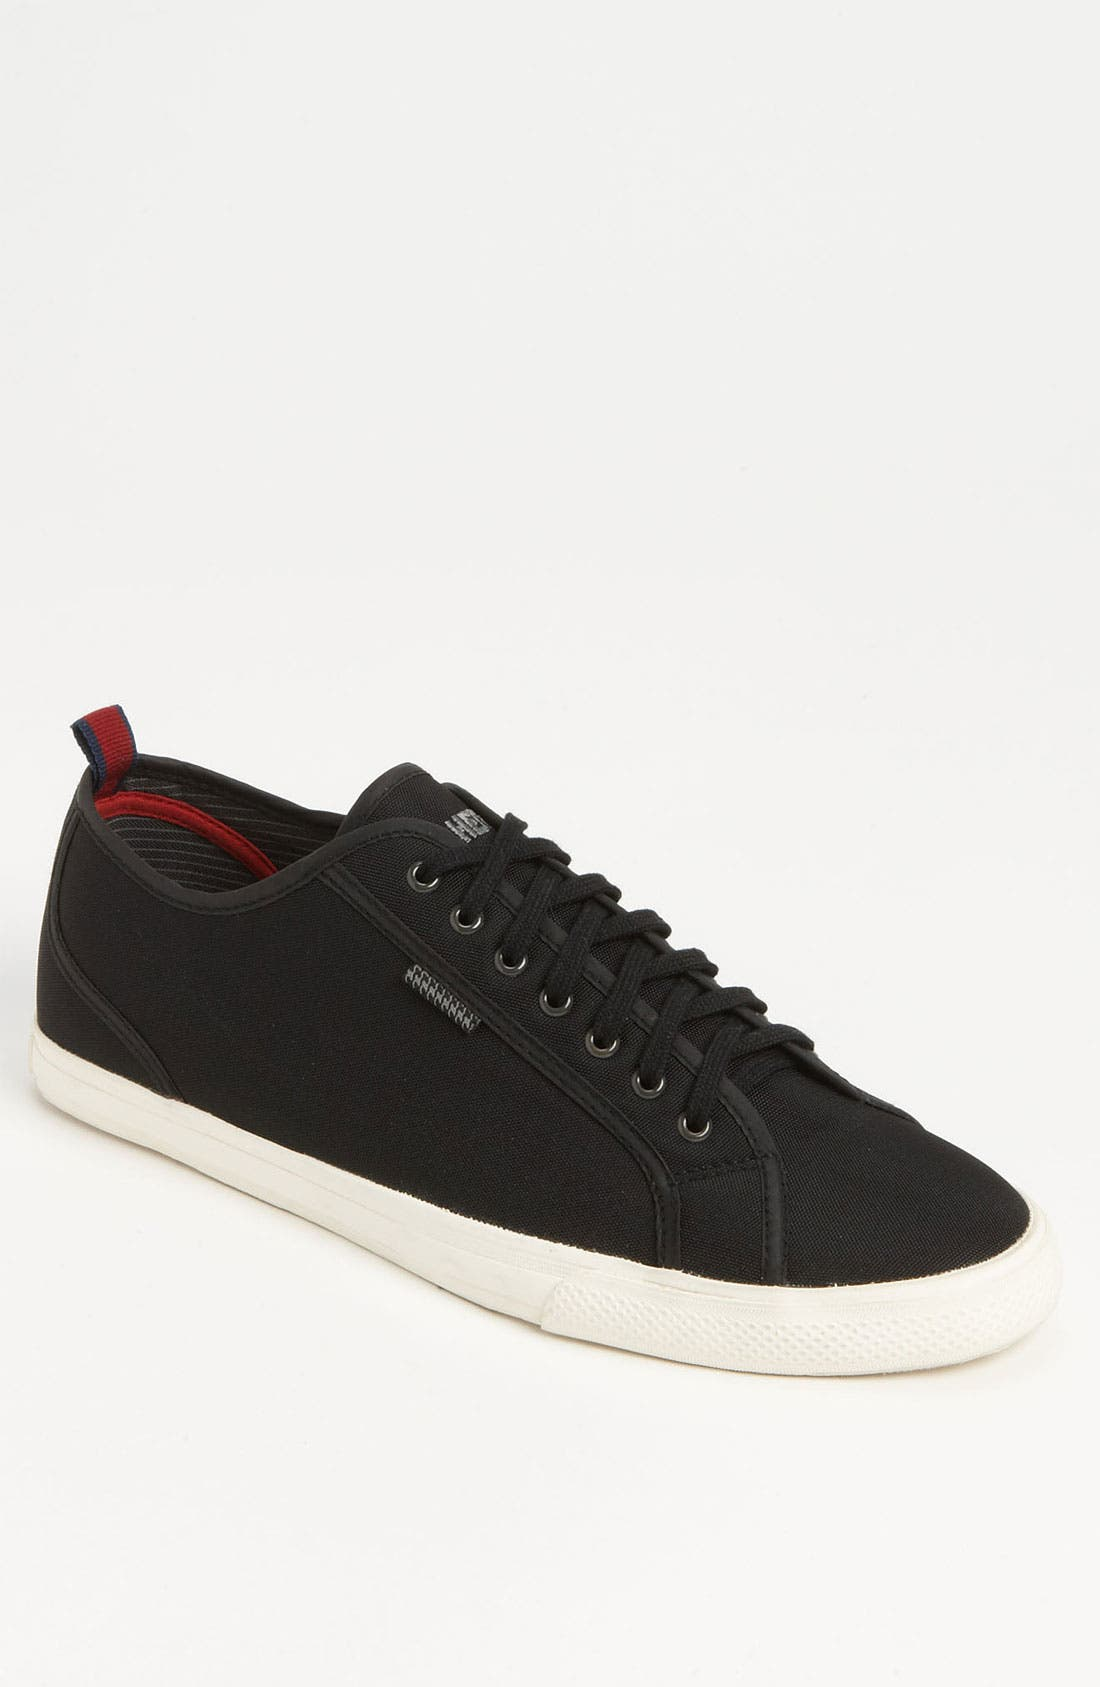 Alternate Image 1 Selected - Ben Sherman 'Breckon' Sneaker (Men)